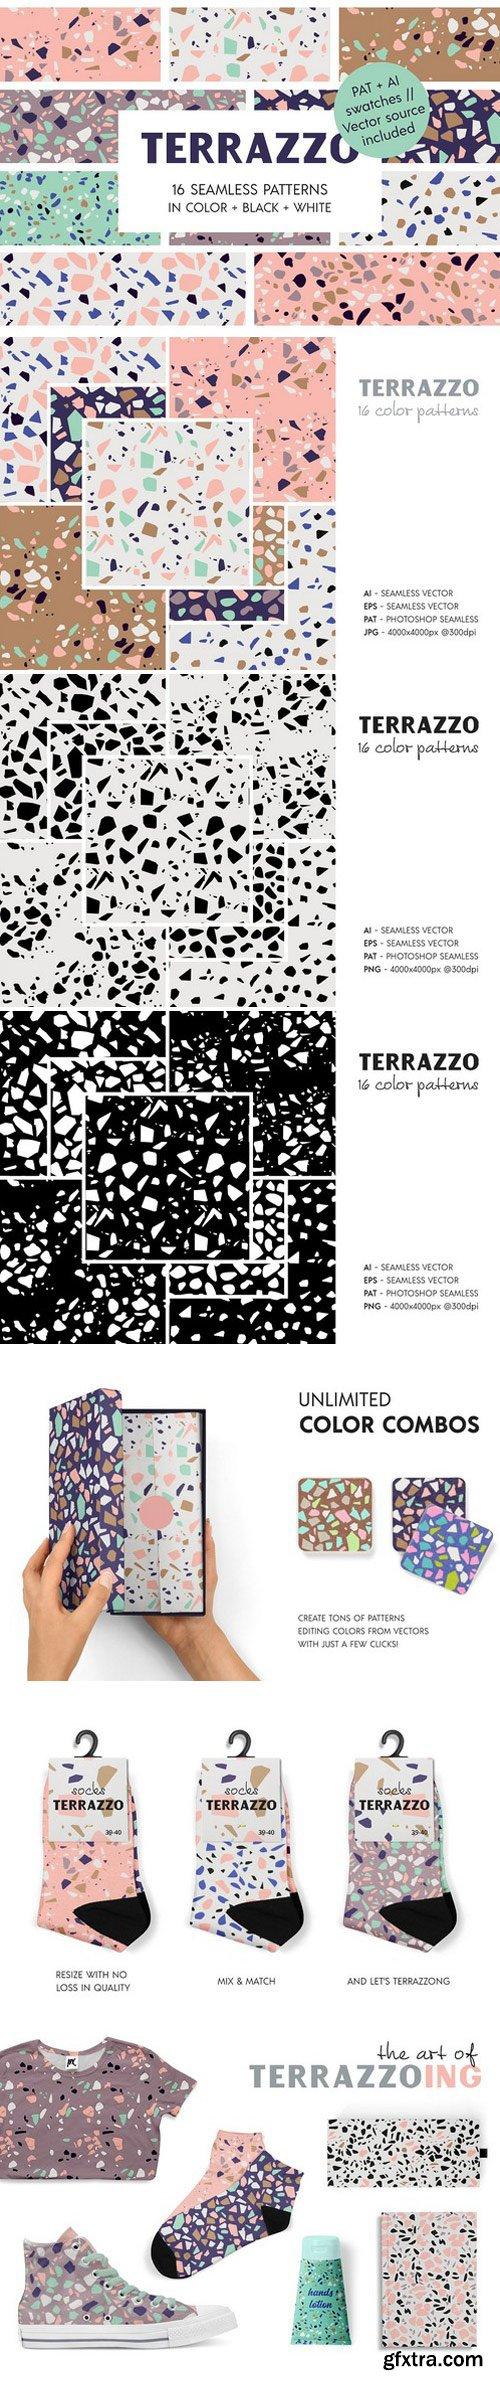 CM - Terrazzo Seamless Patterns 2430234